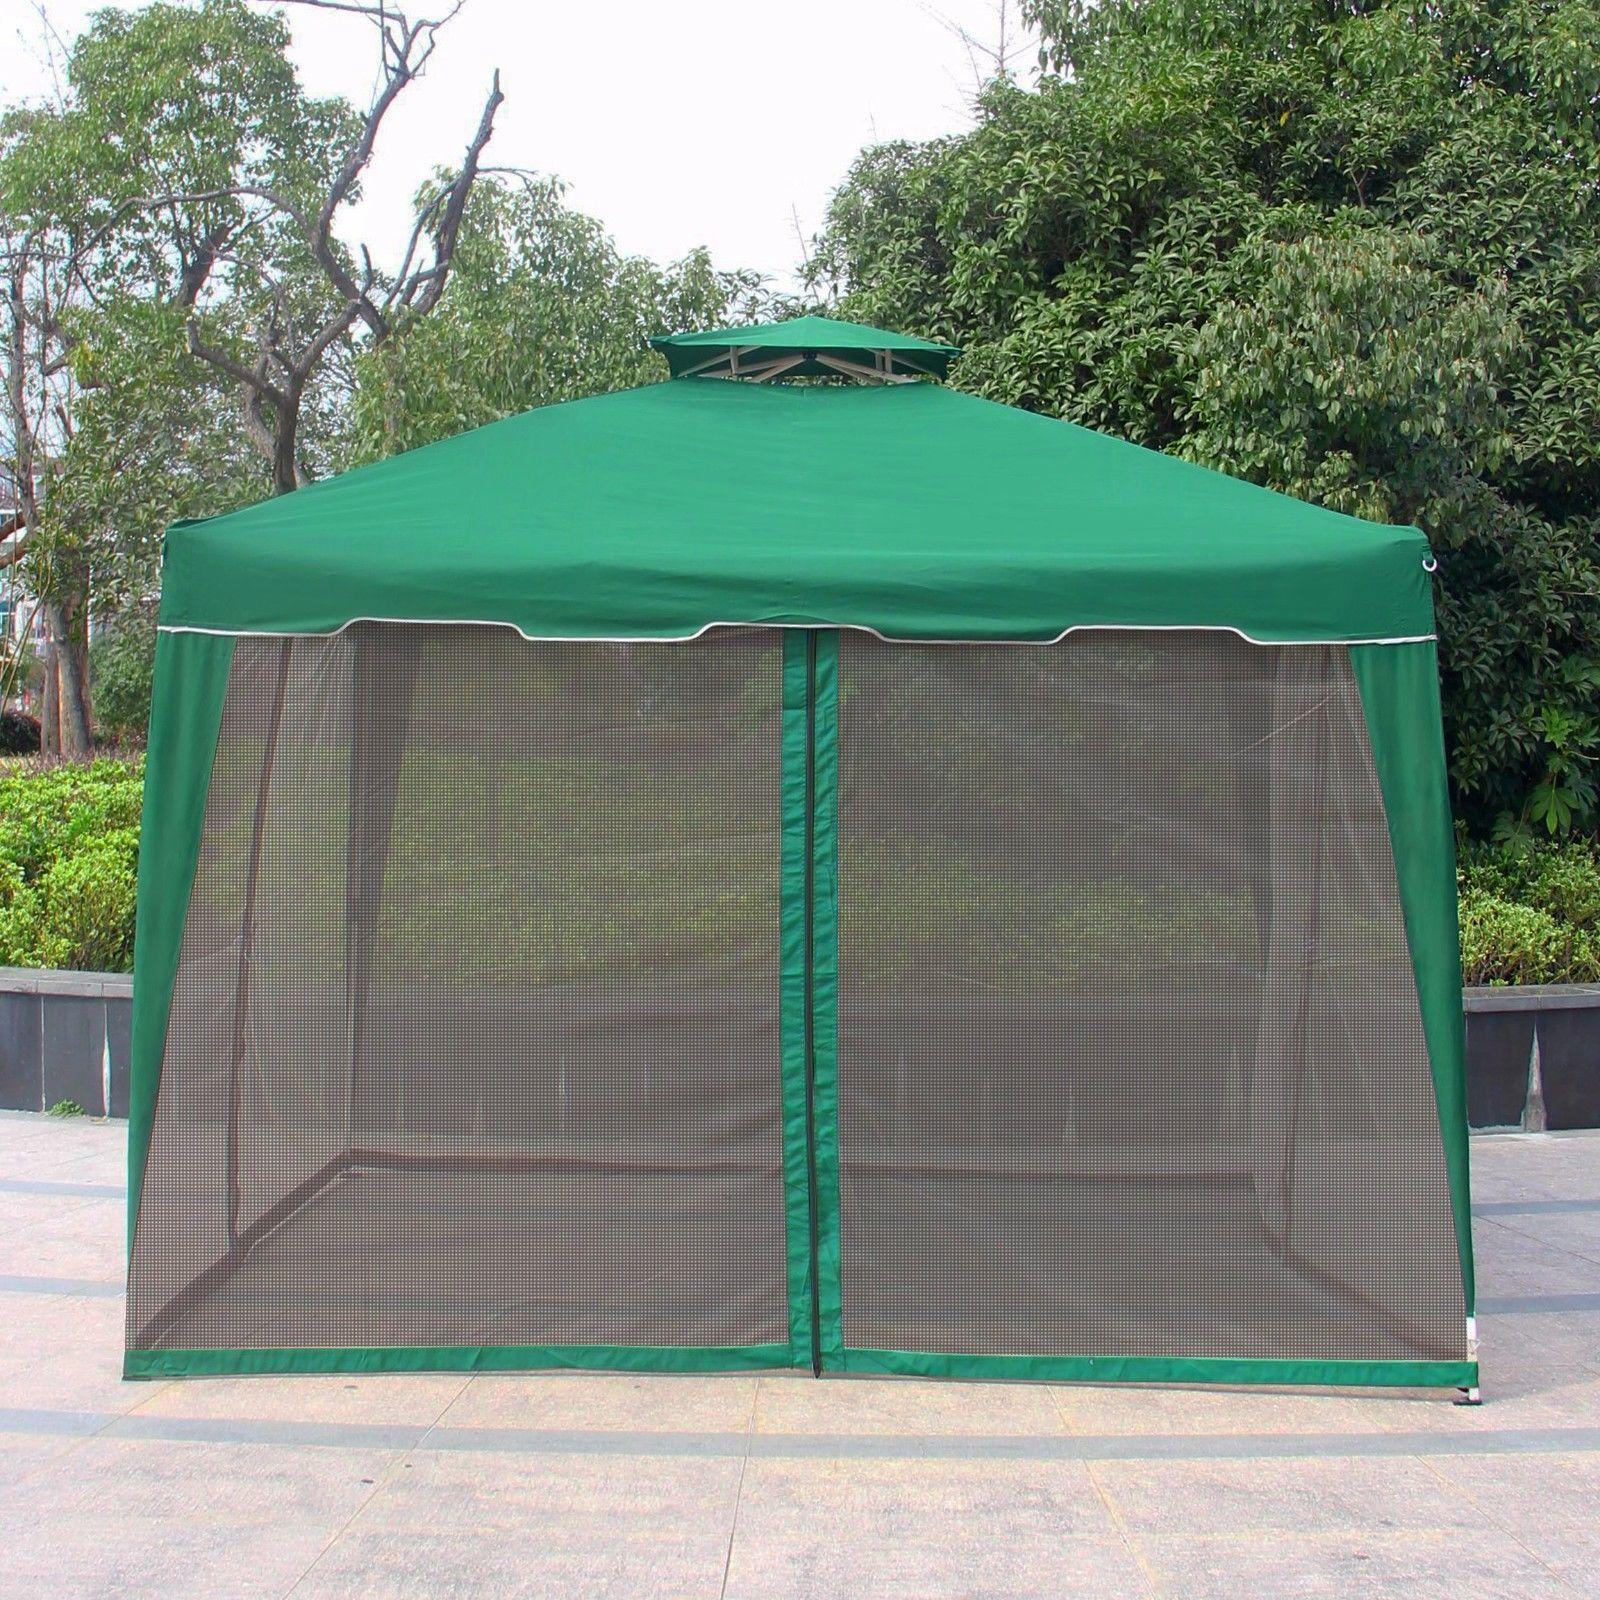 Patio Umbrella Netting: 10' X 10' Gazebo Replacement Outdoor Garden Gazebo Canopy